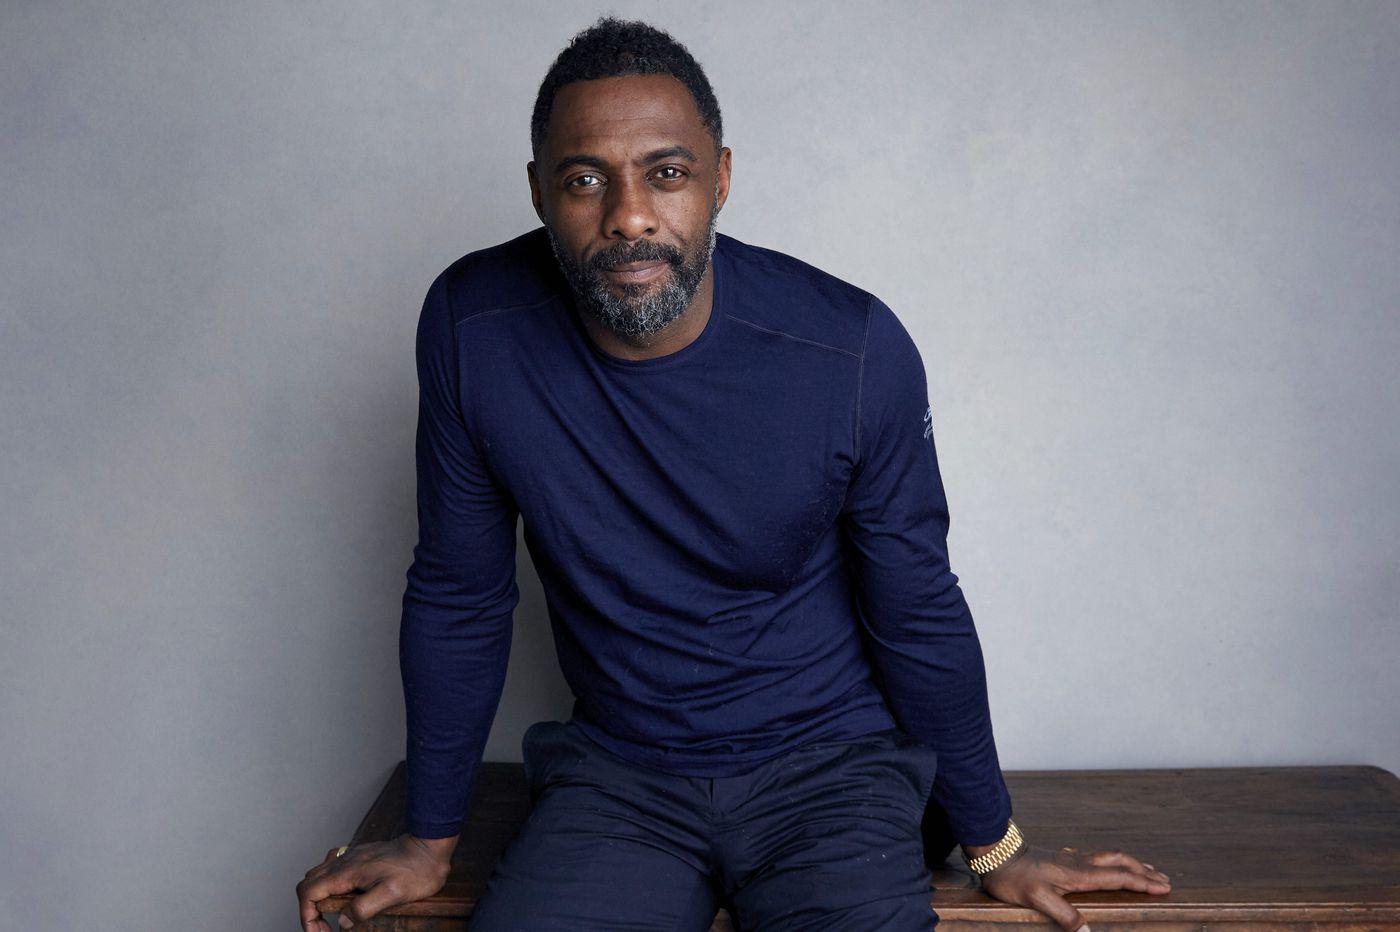 Duh, Idris Elba is People magazine's 'Sexiest Man Alive' | Elizabeth Wellington